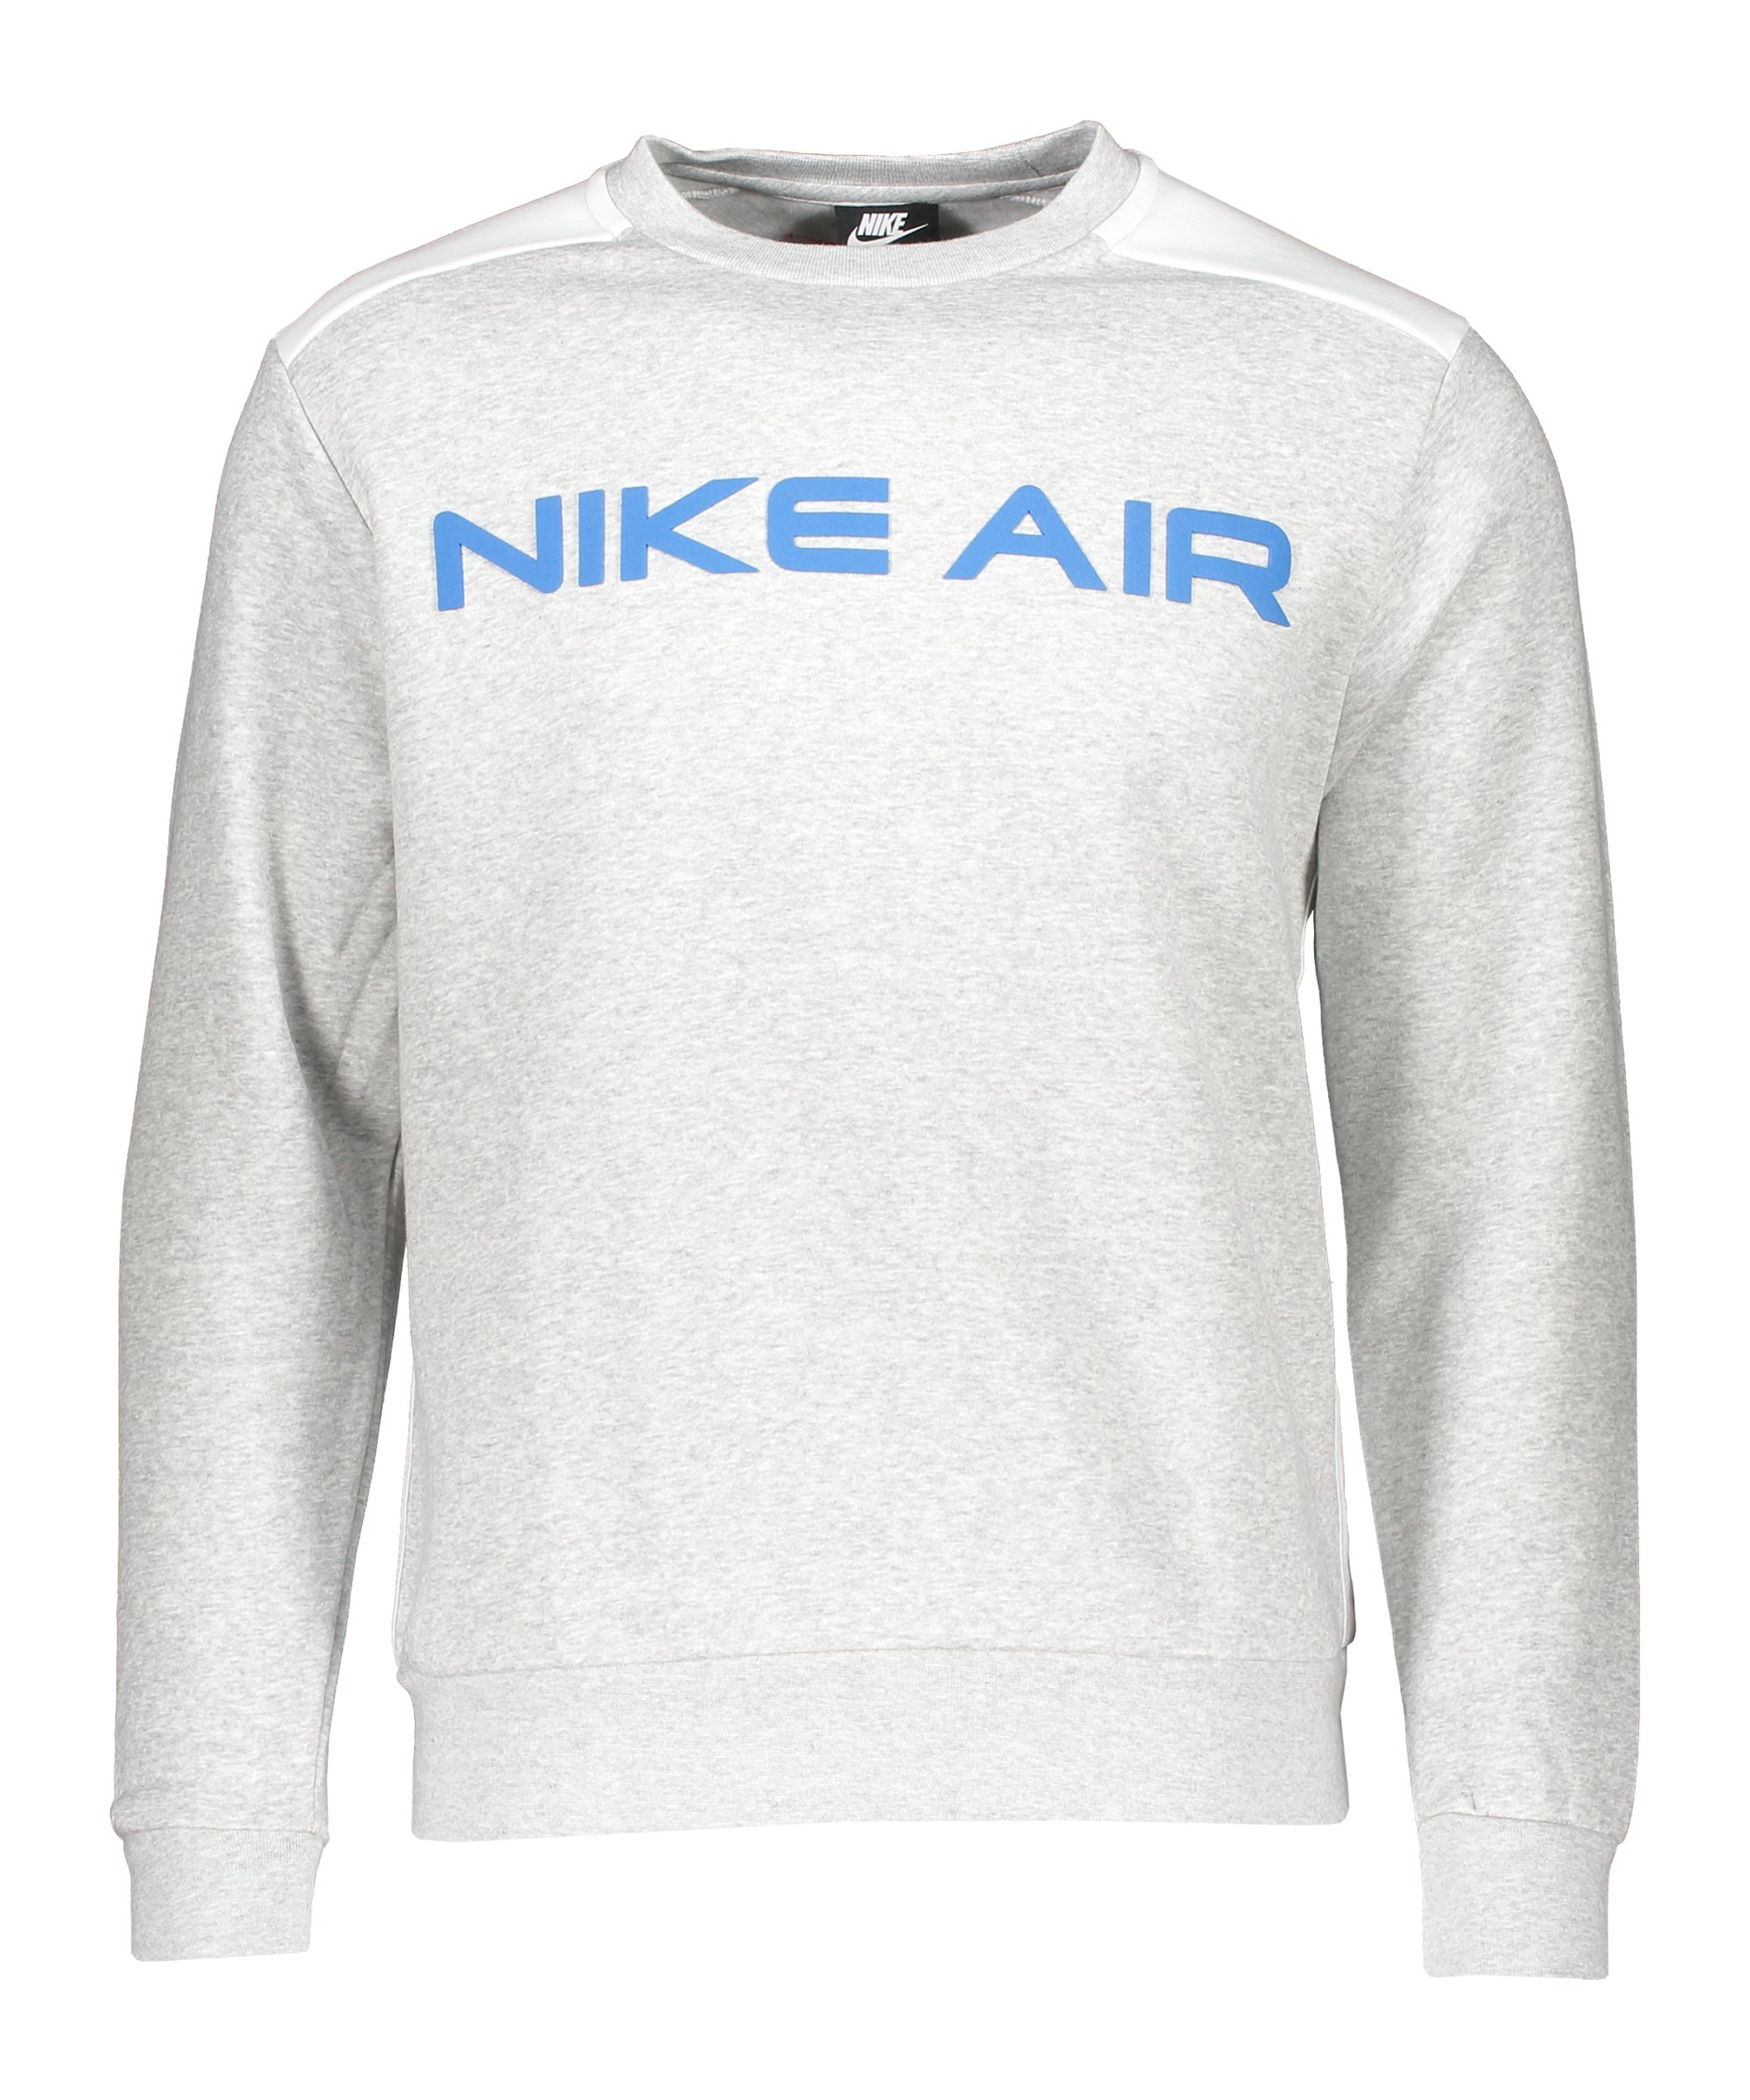 Nike Air Fleece Sweatshirt Grau Weiss F052 - grau